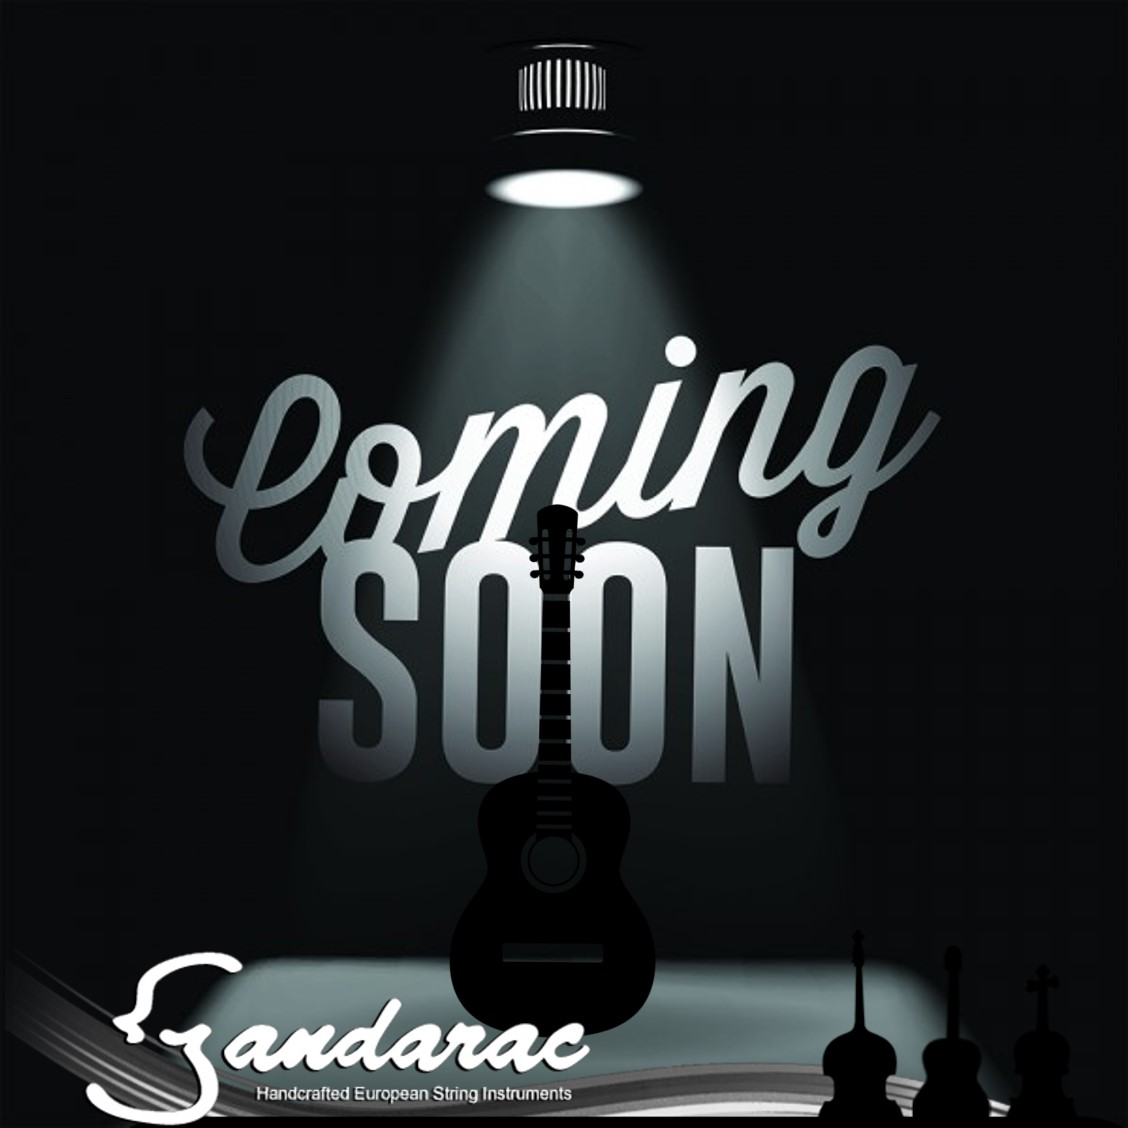 13 - Coming soon